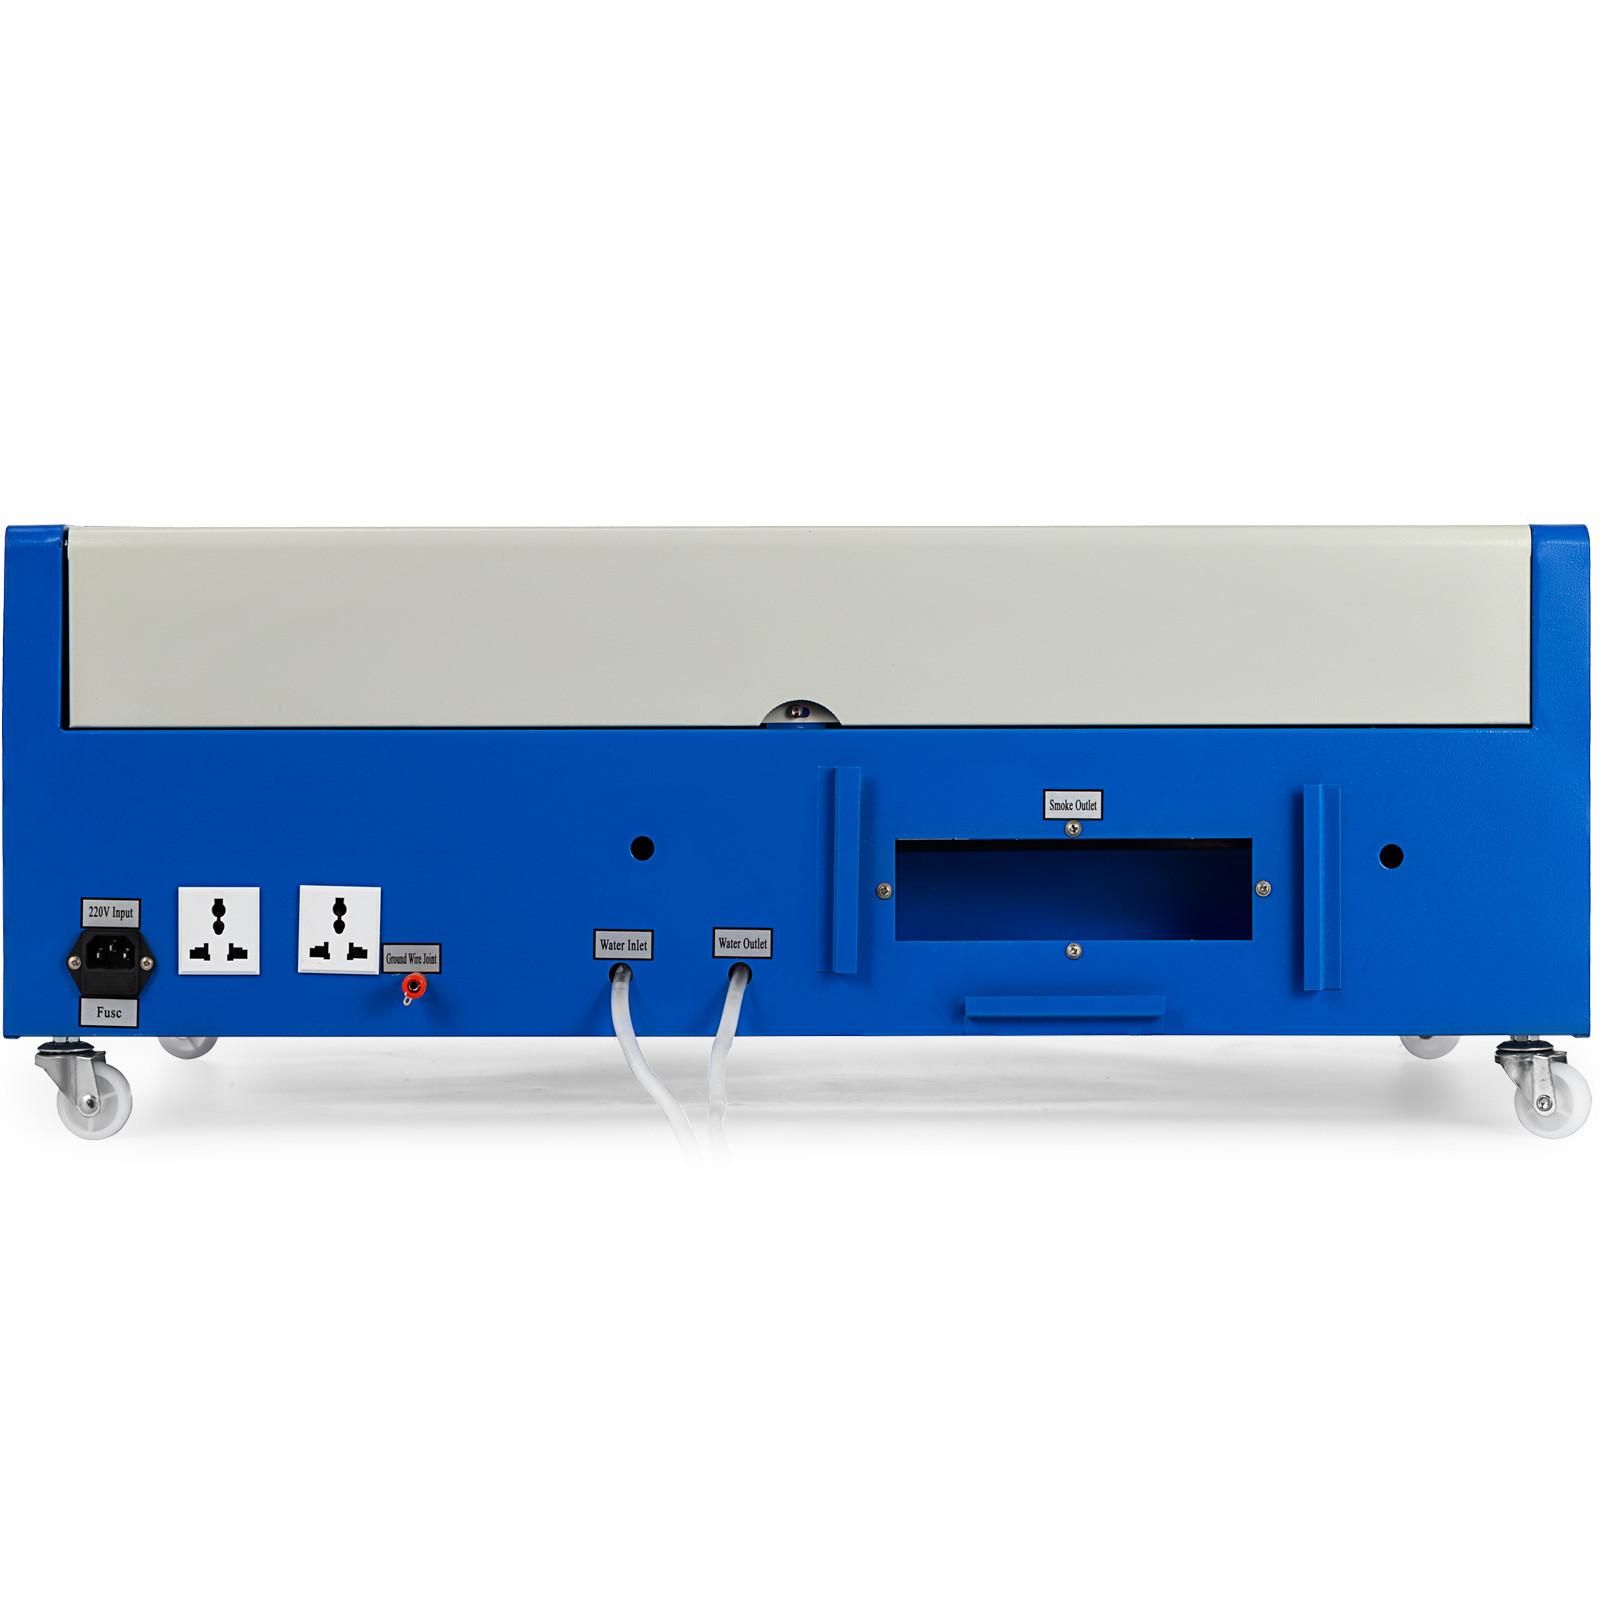 Macchina-per-Incisione-Laser-CO2-40-130W-Asse-Rotante-Tagliatrice-Incisore miniatura 99